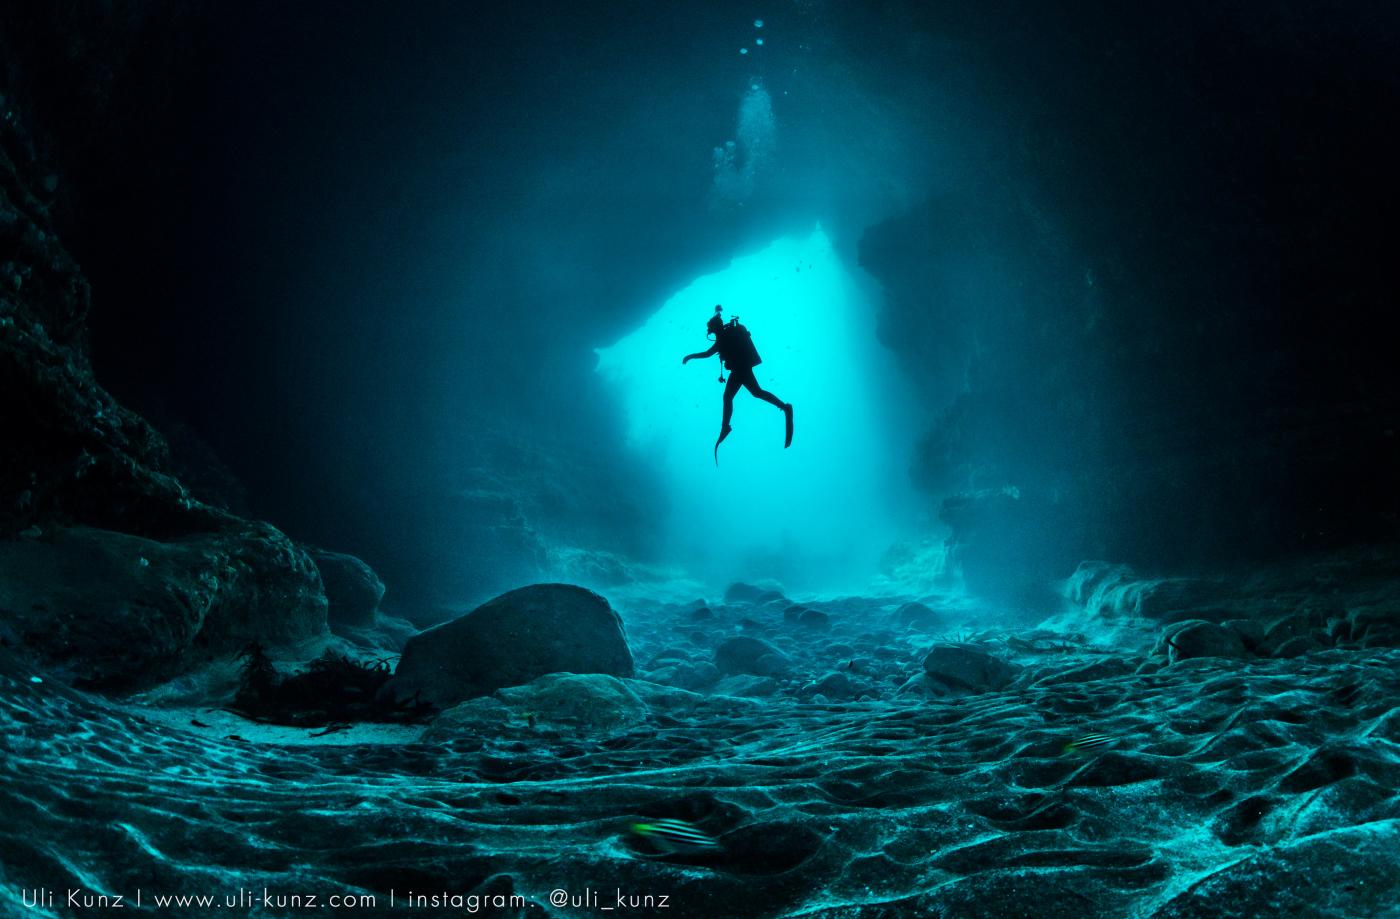 Titoni_Seascoper_600_cathedral_cave_-_europa_star_watch_magazine_2020